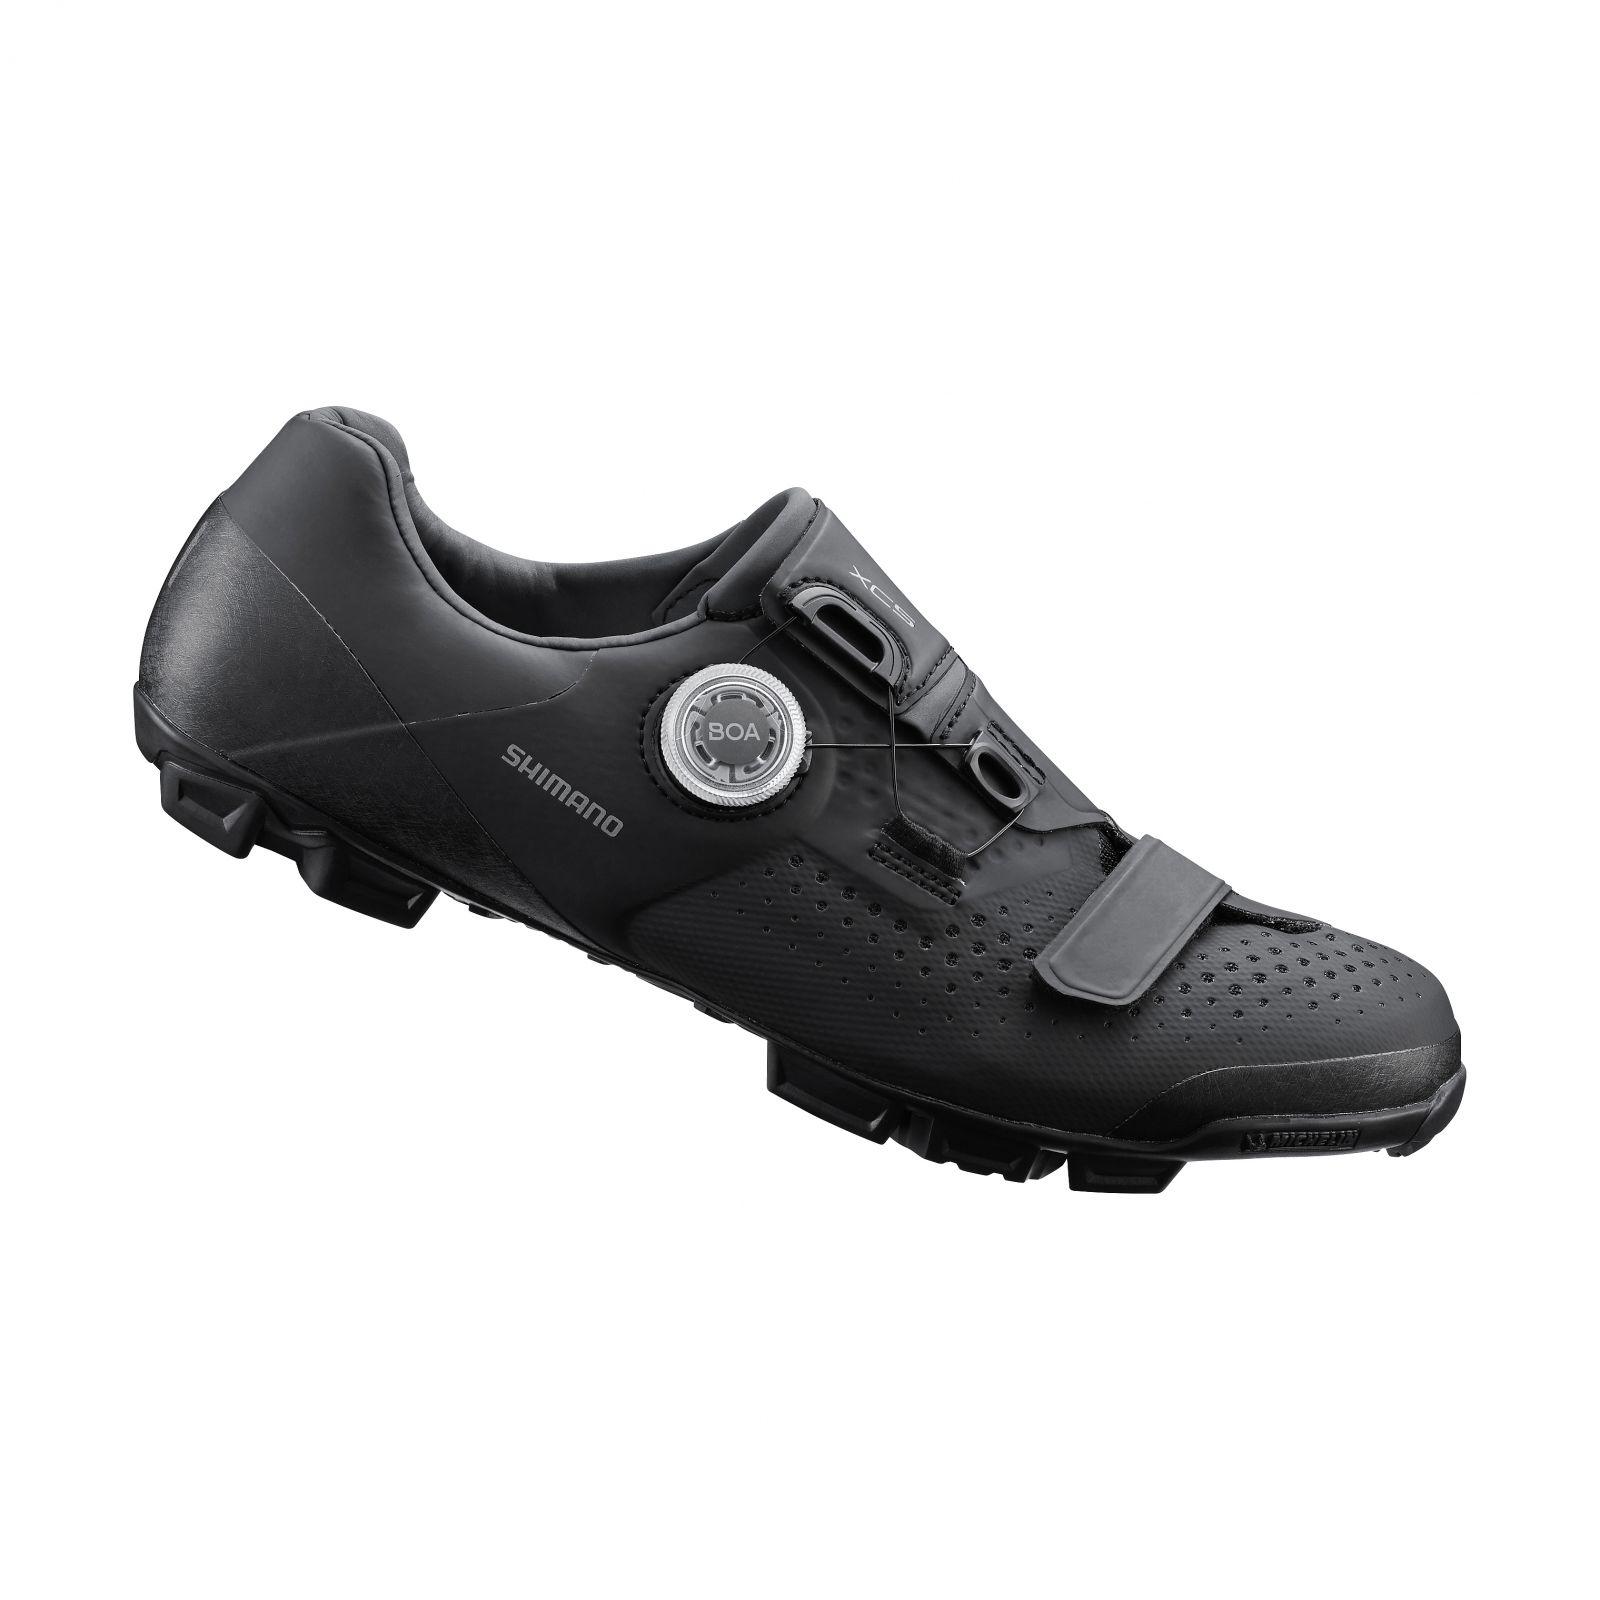 SHIMANO MTB obuv SH-XC501ML, černá, 44